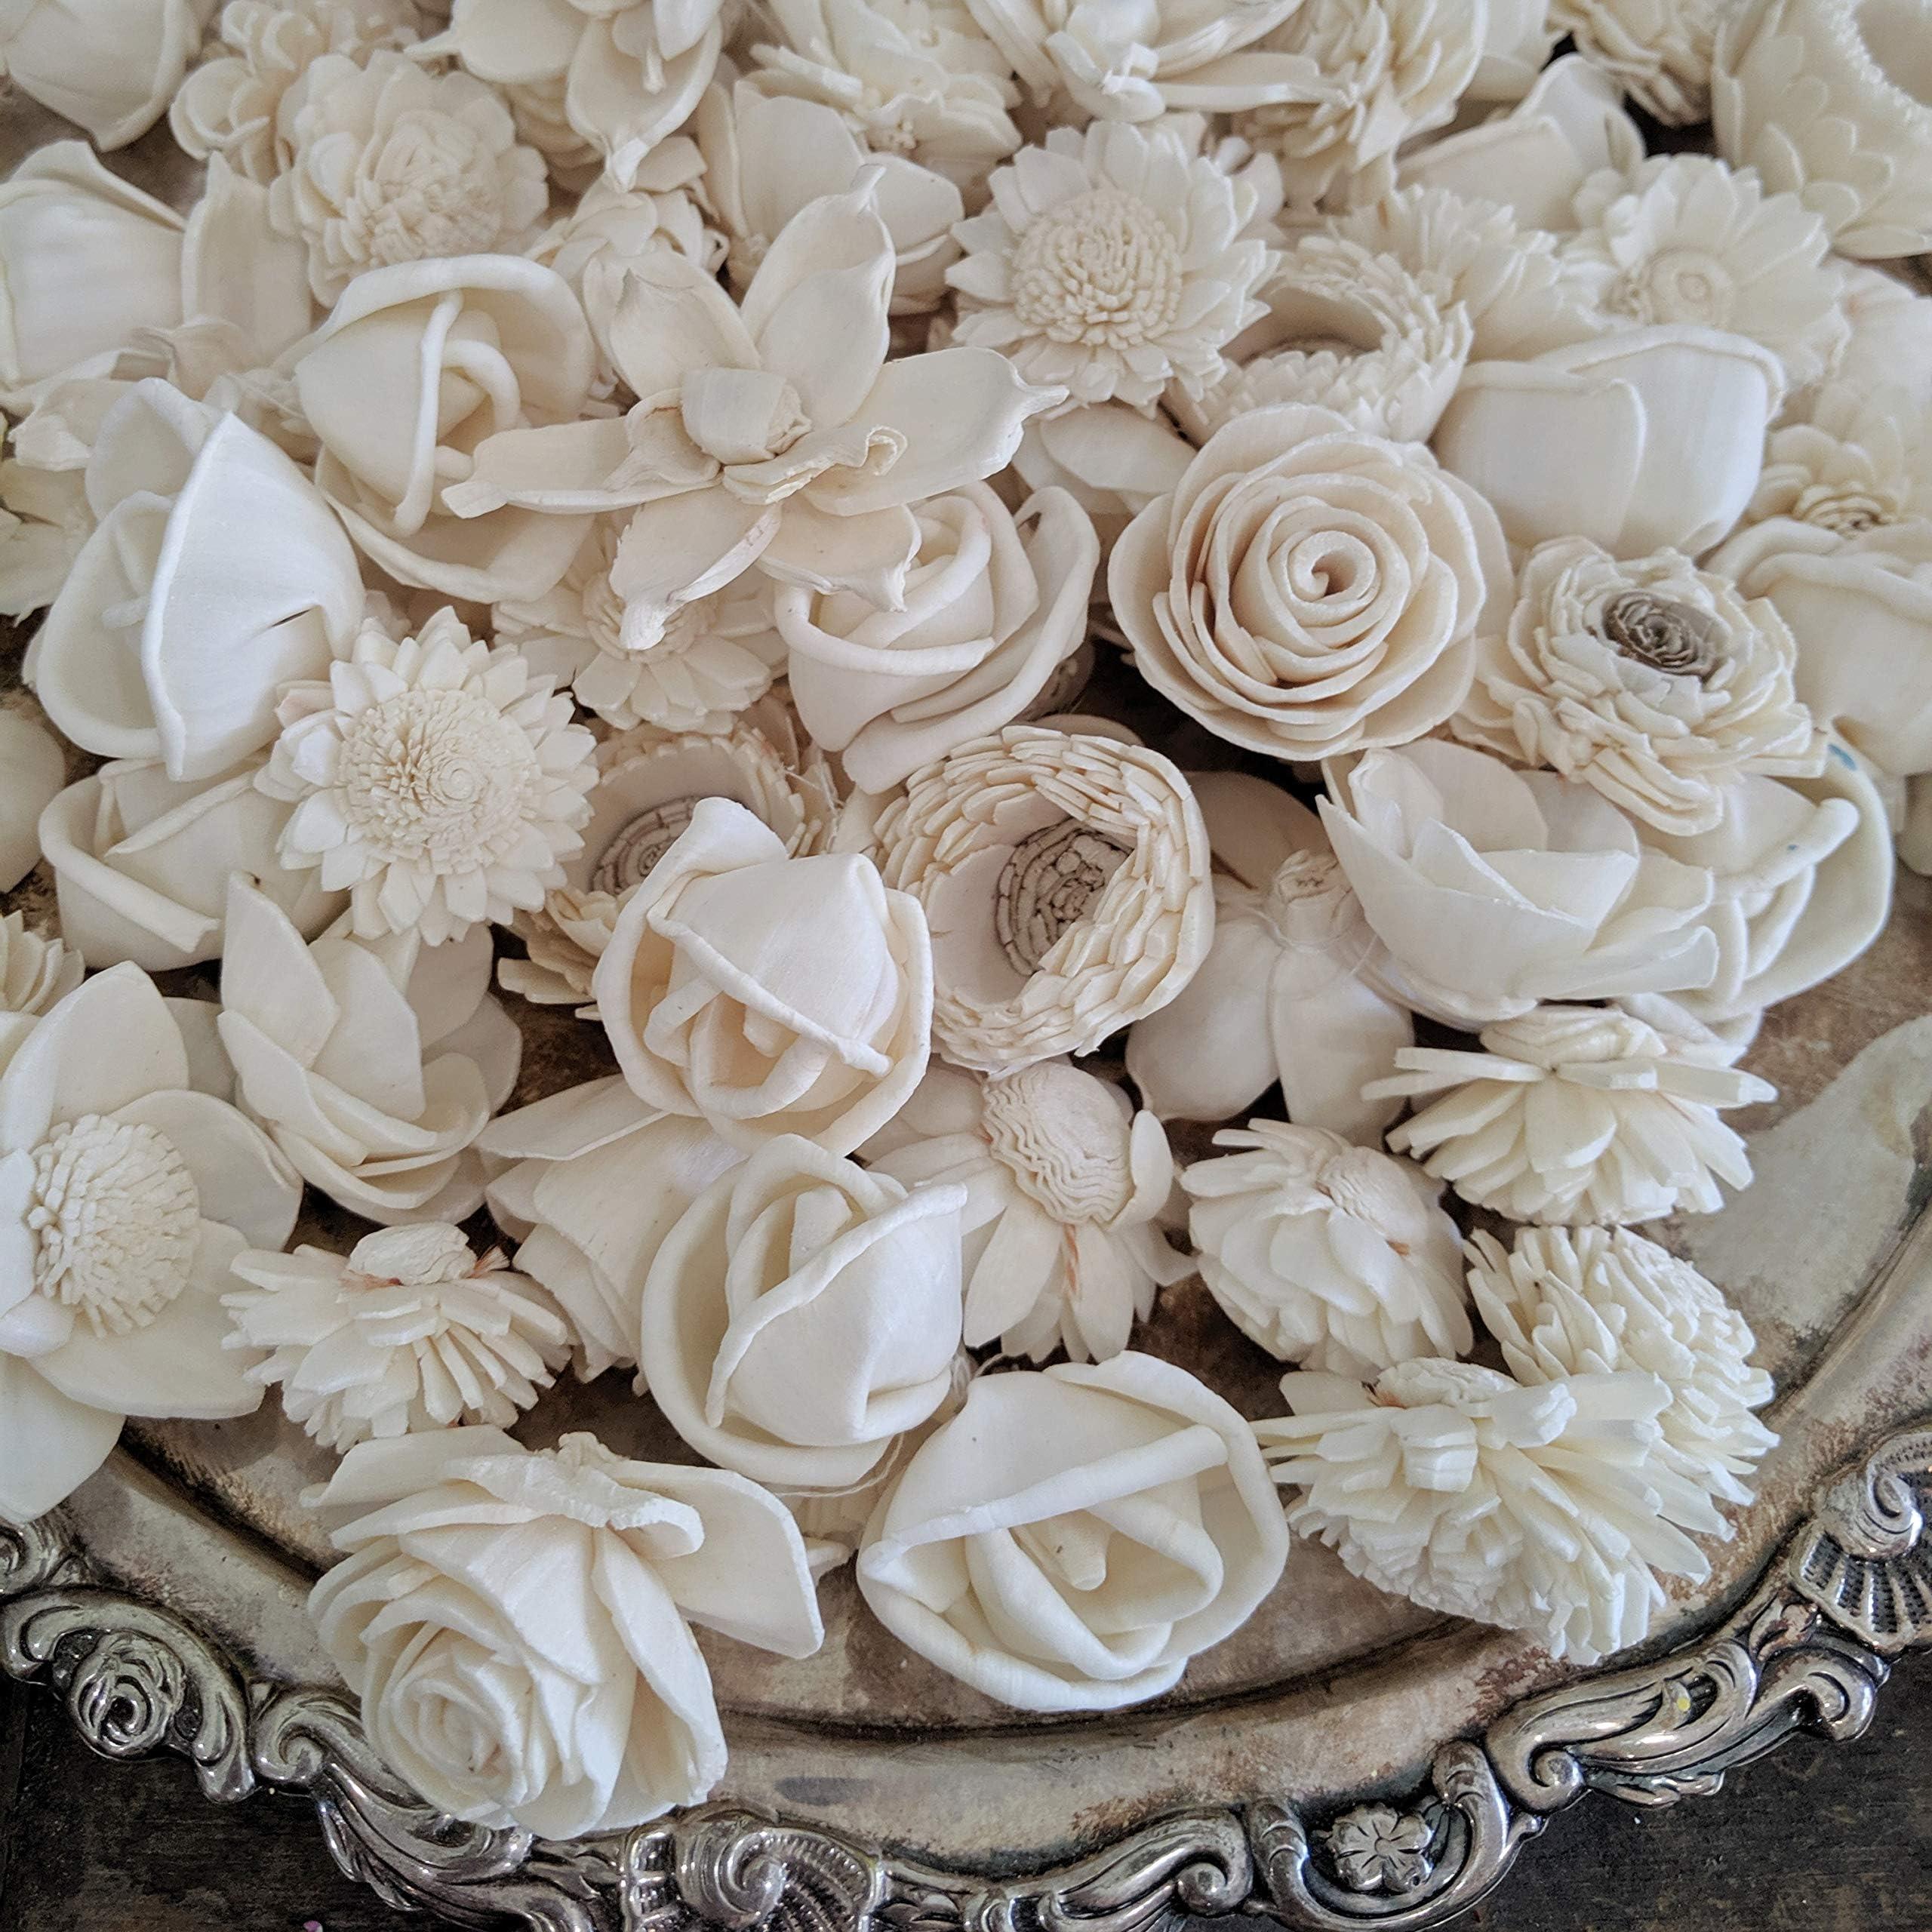 100 pack of mini Sola flowers assortment